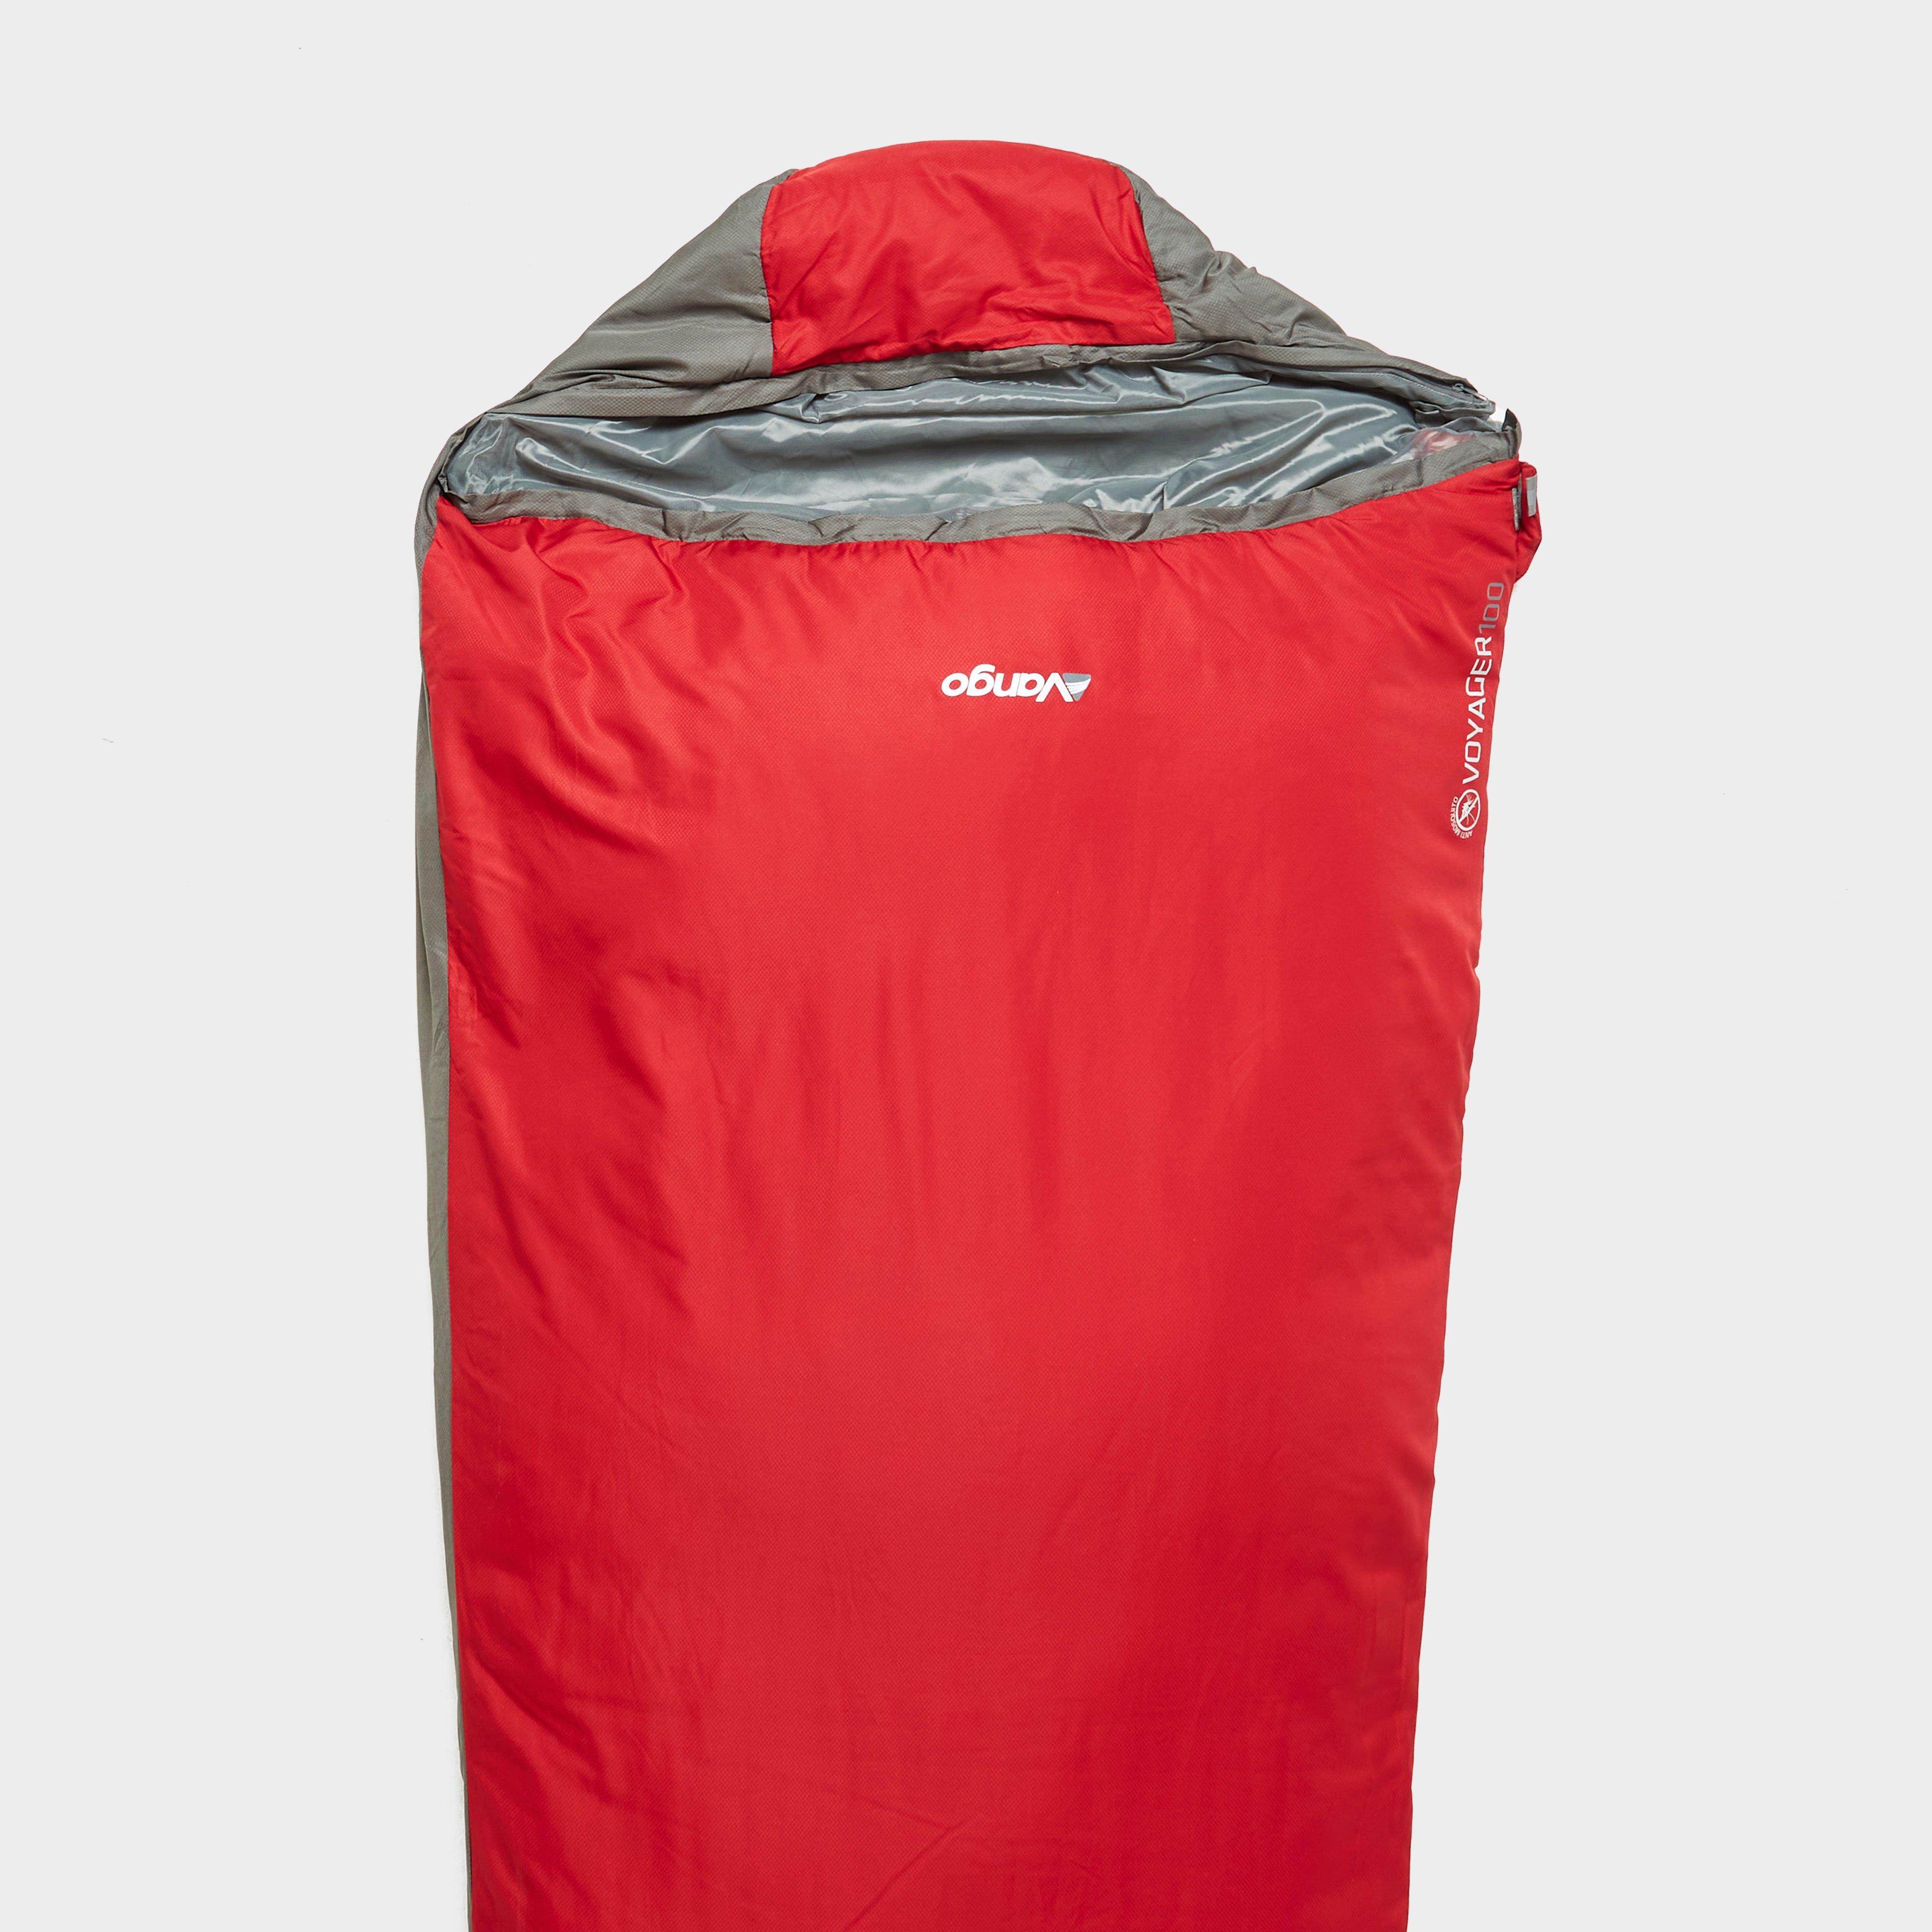 Vango Vango Voyager 100 Sleeping Bag - Red, Red